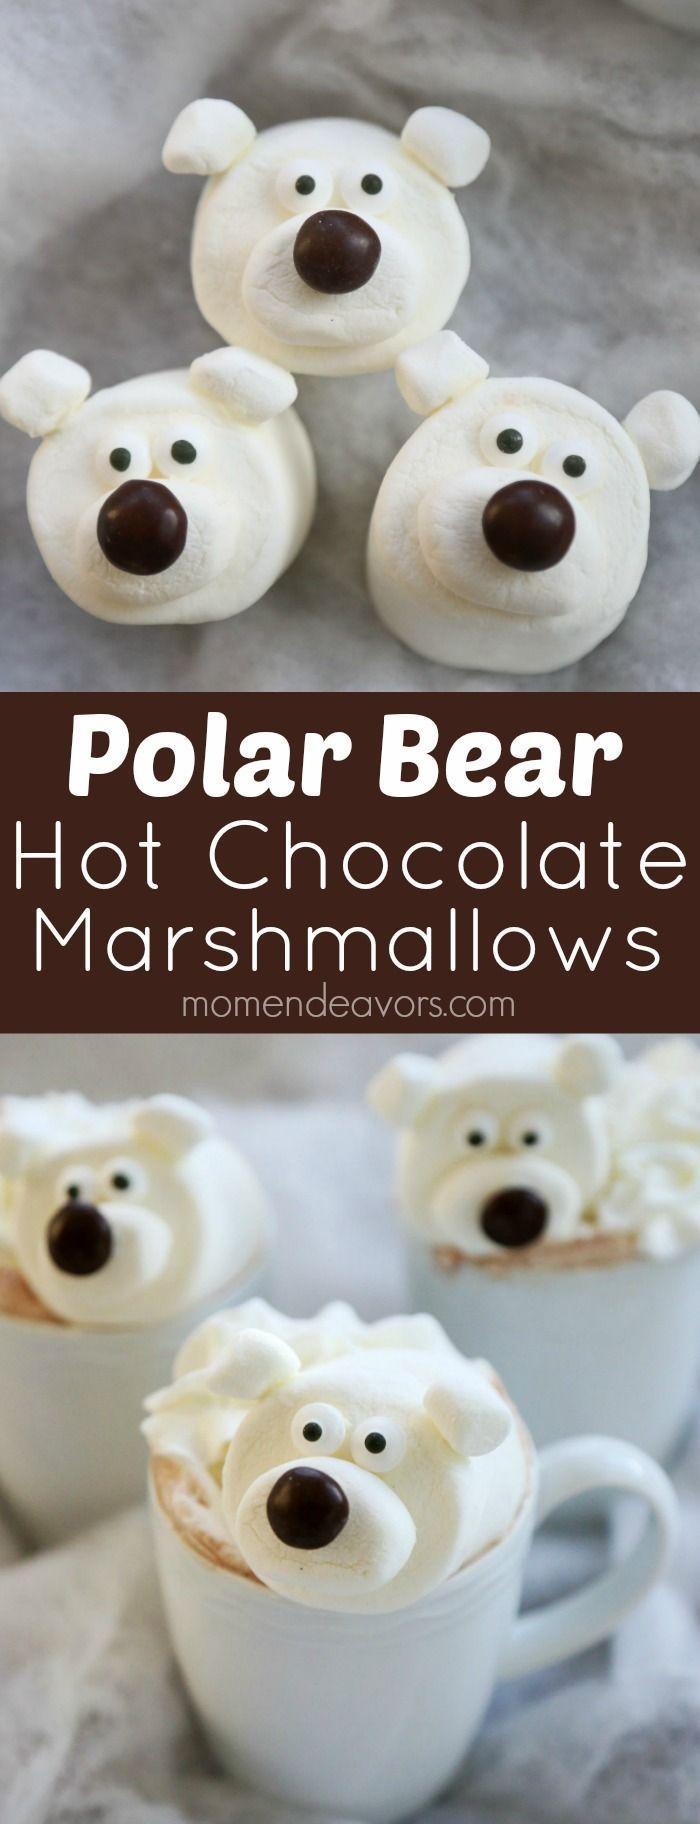 Kids will LOVE polar bear hot chocolate!!! So fun & easy to make!!!